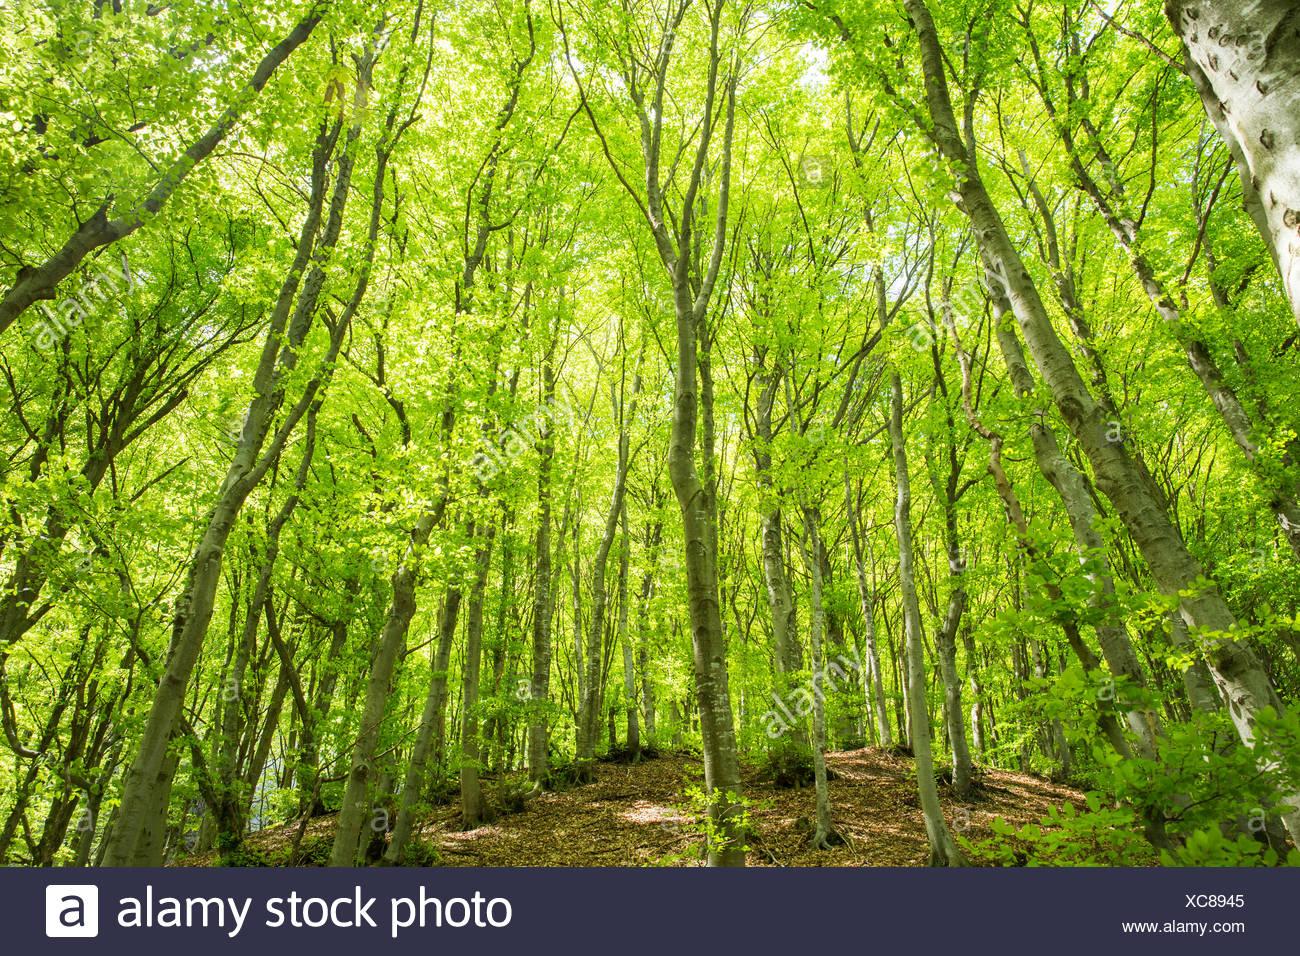 Lugano, Holz, Wald, Monte Boglia, Kanton, Ticino, Tessin, Holz, Wald, Schweiz, Europa, Stockbild